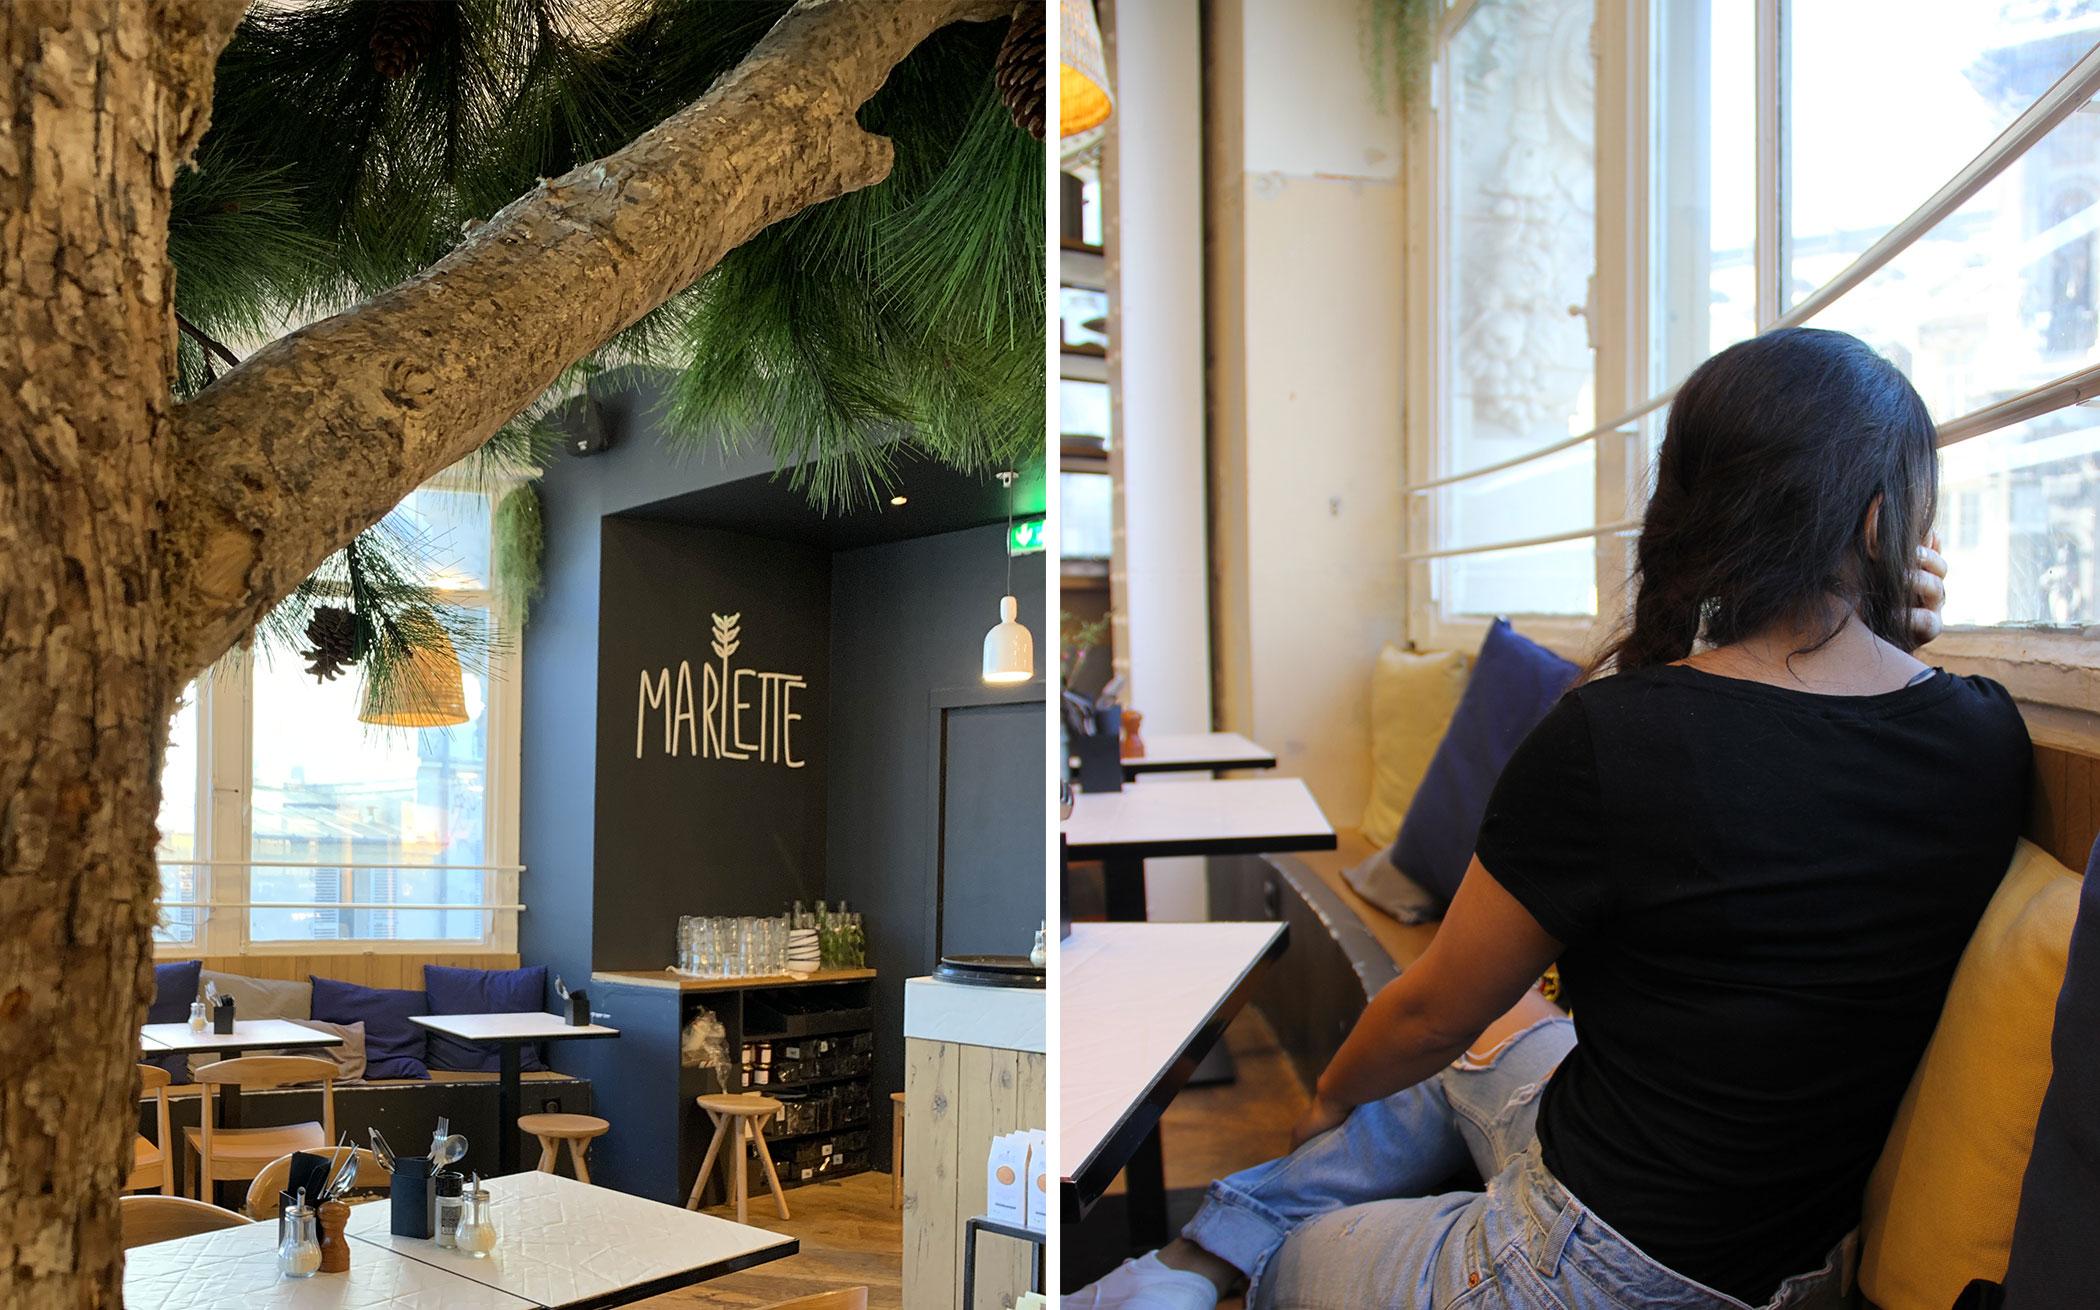 Launch at Marlette Paris, Saint- Paul. Where to find healthy food in Paris.